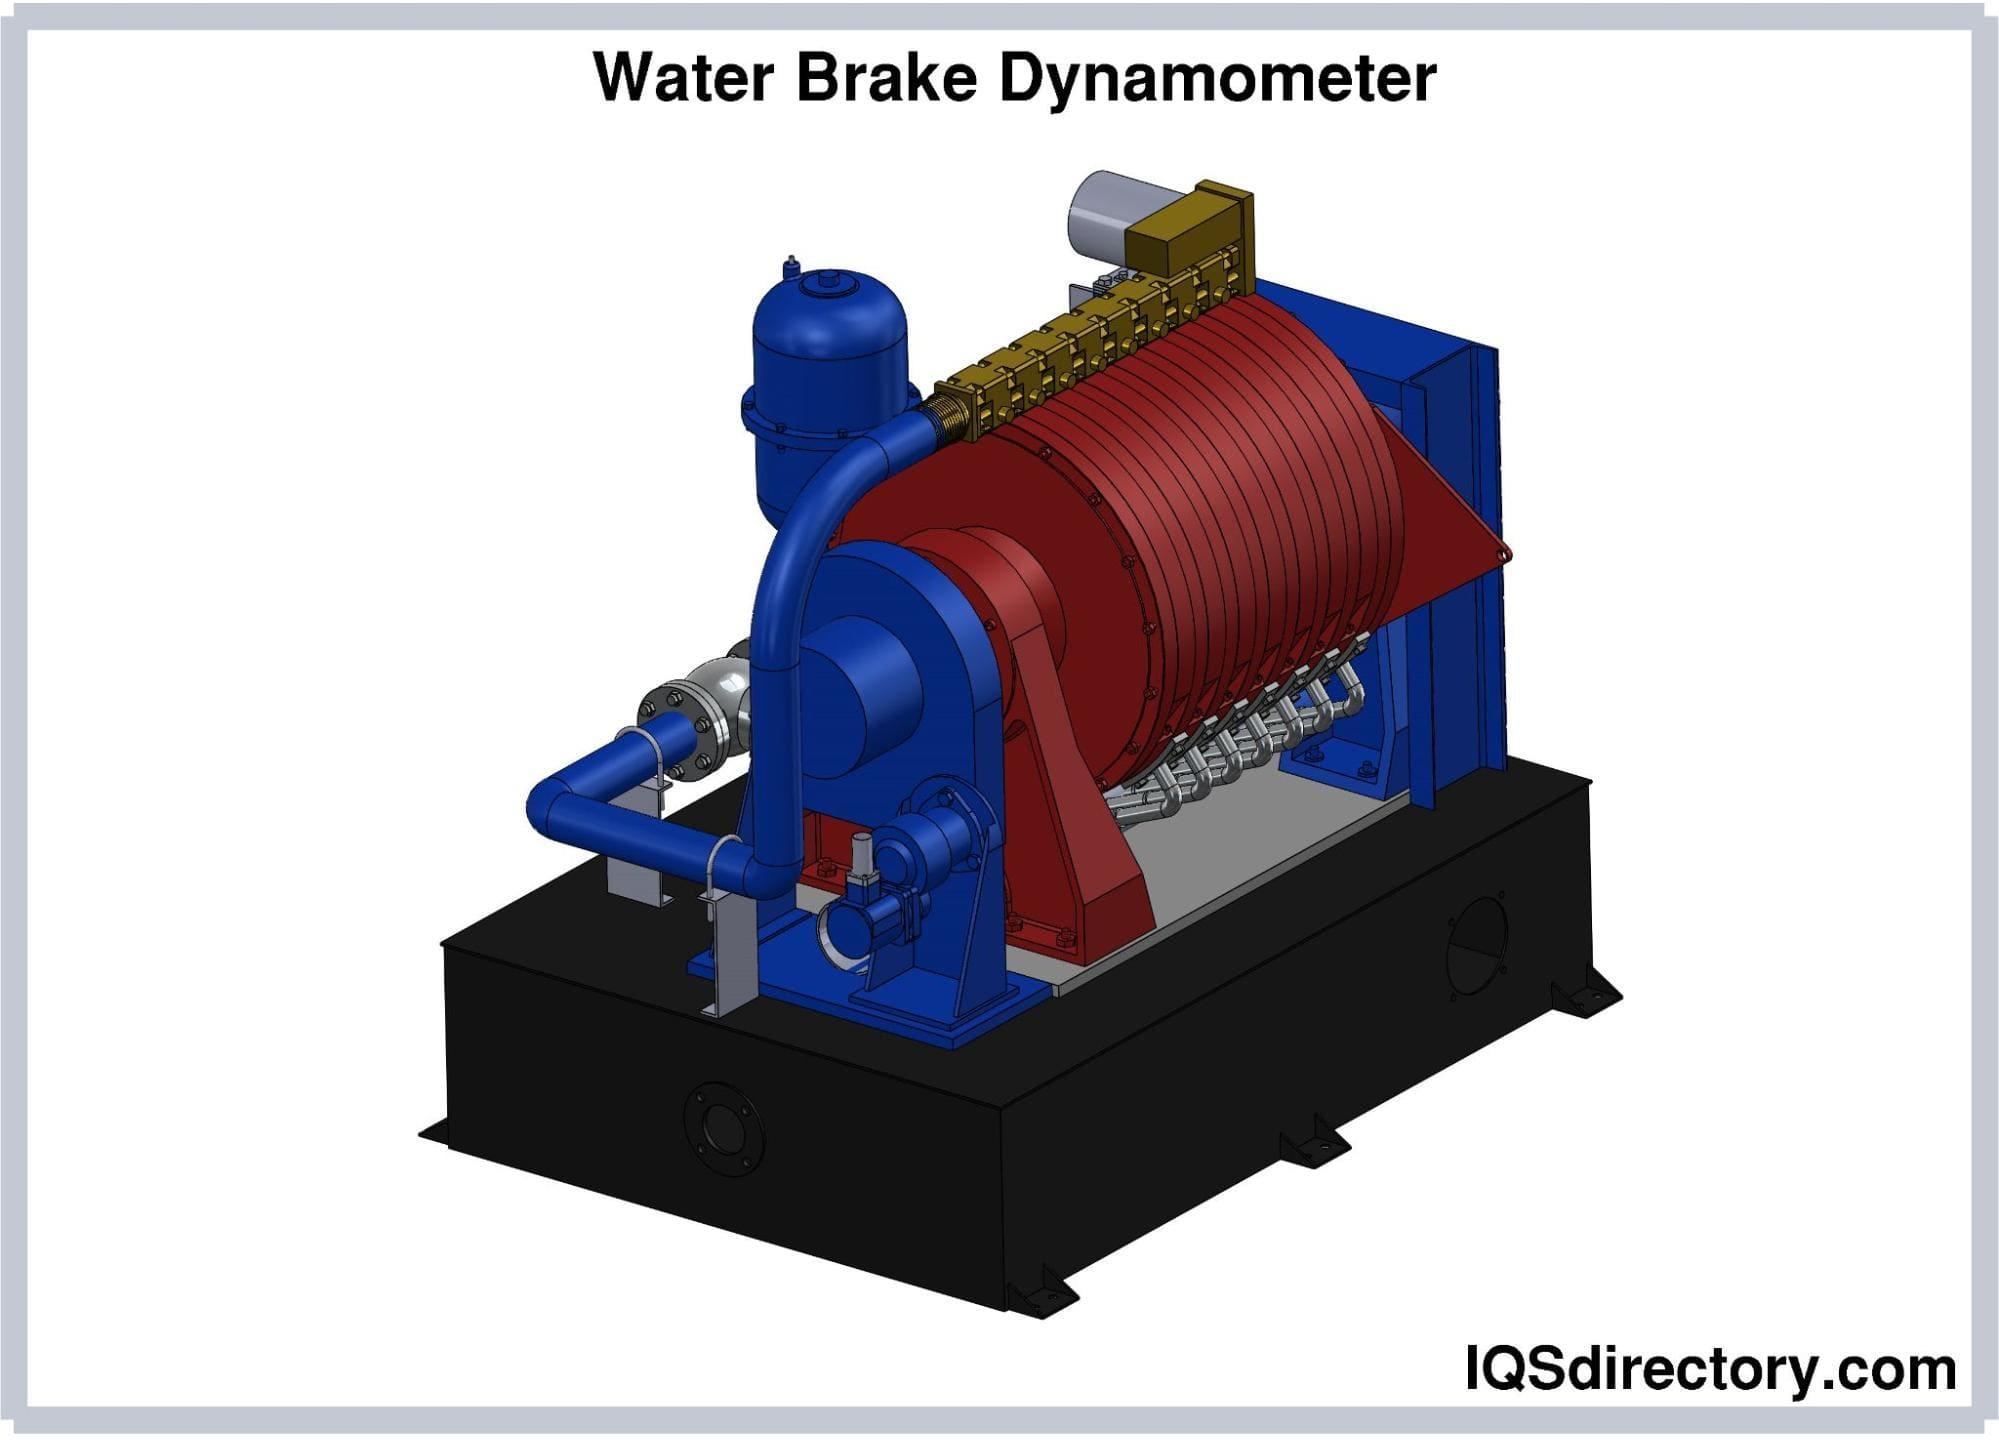 Water Brake Dynamometer